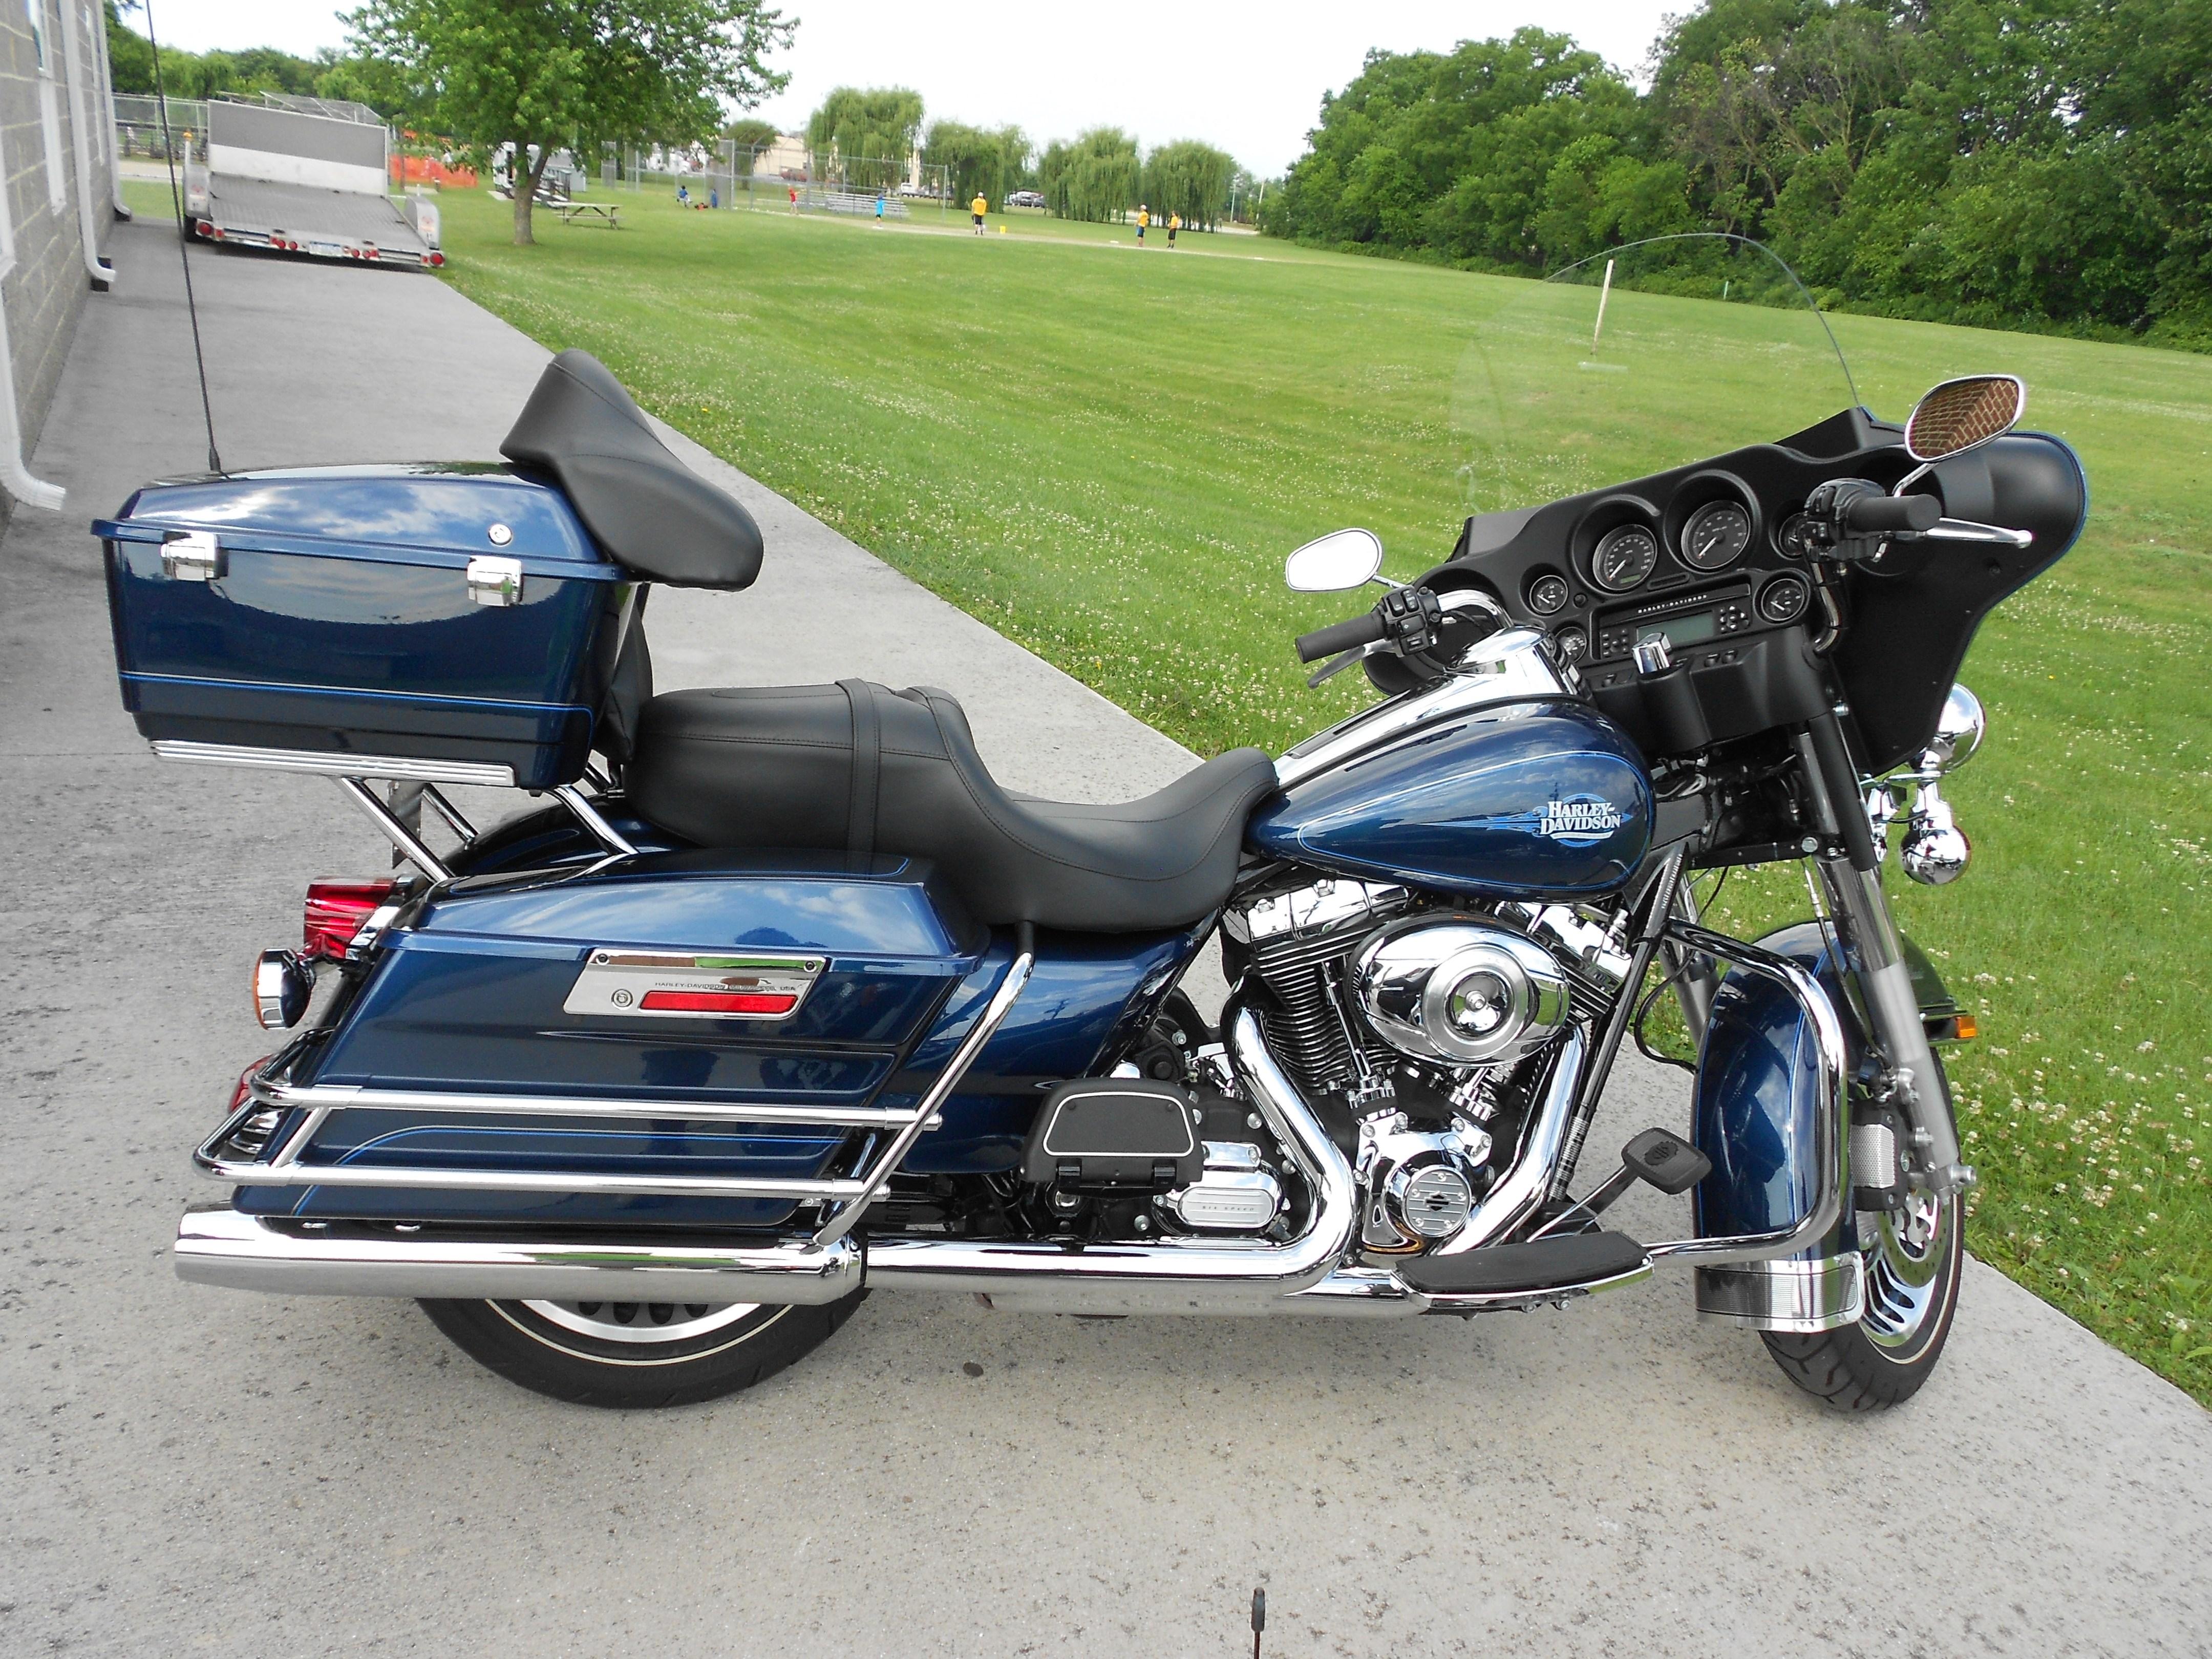 2013 Harley-Davidson® FLHTC Electra Glide